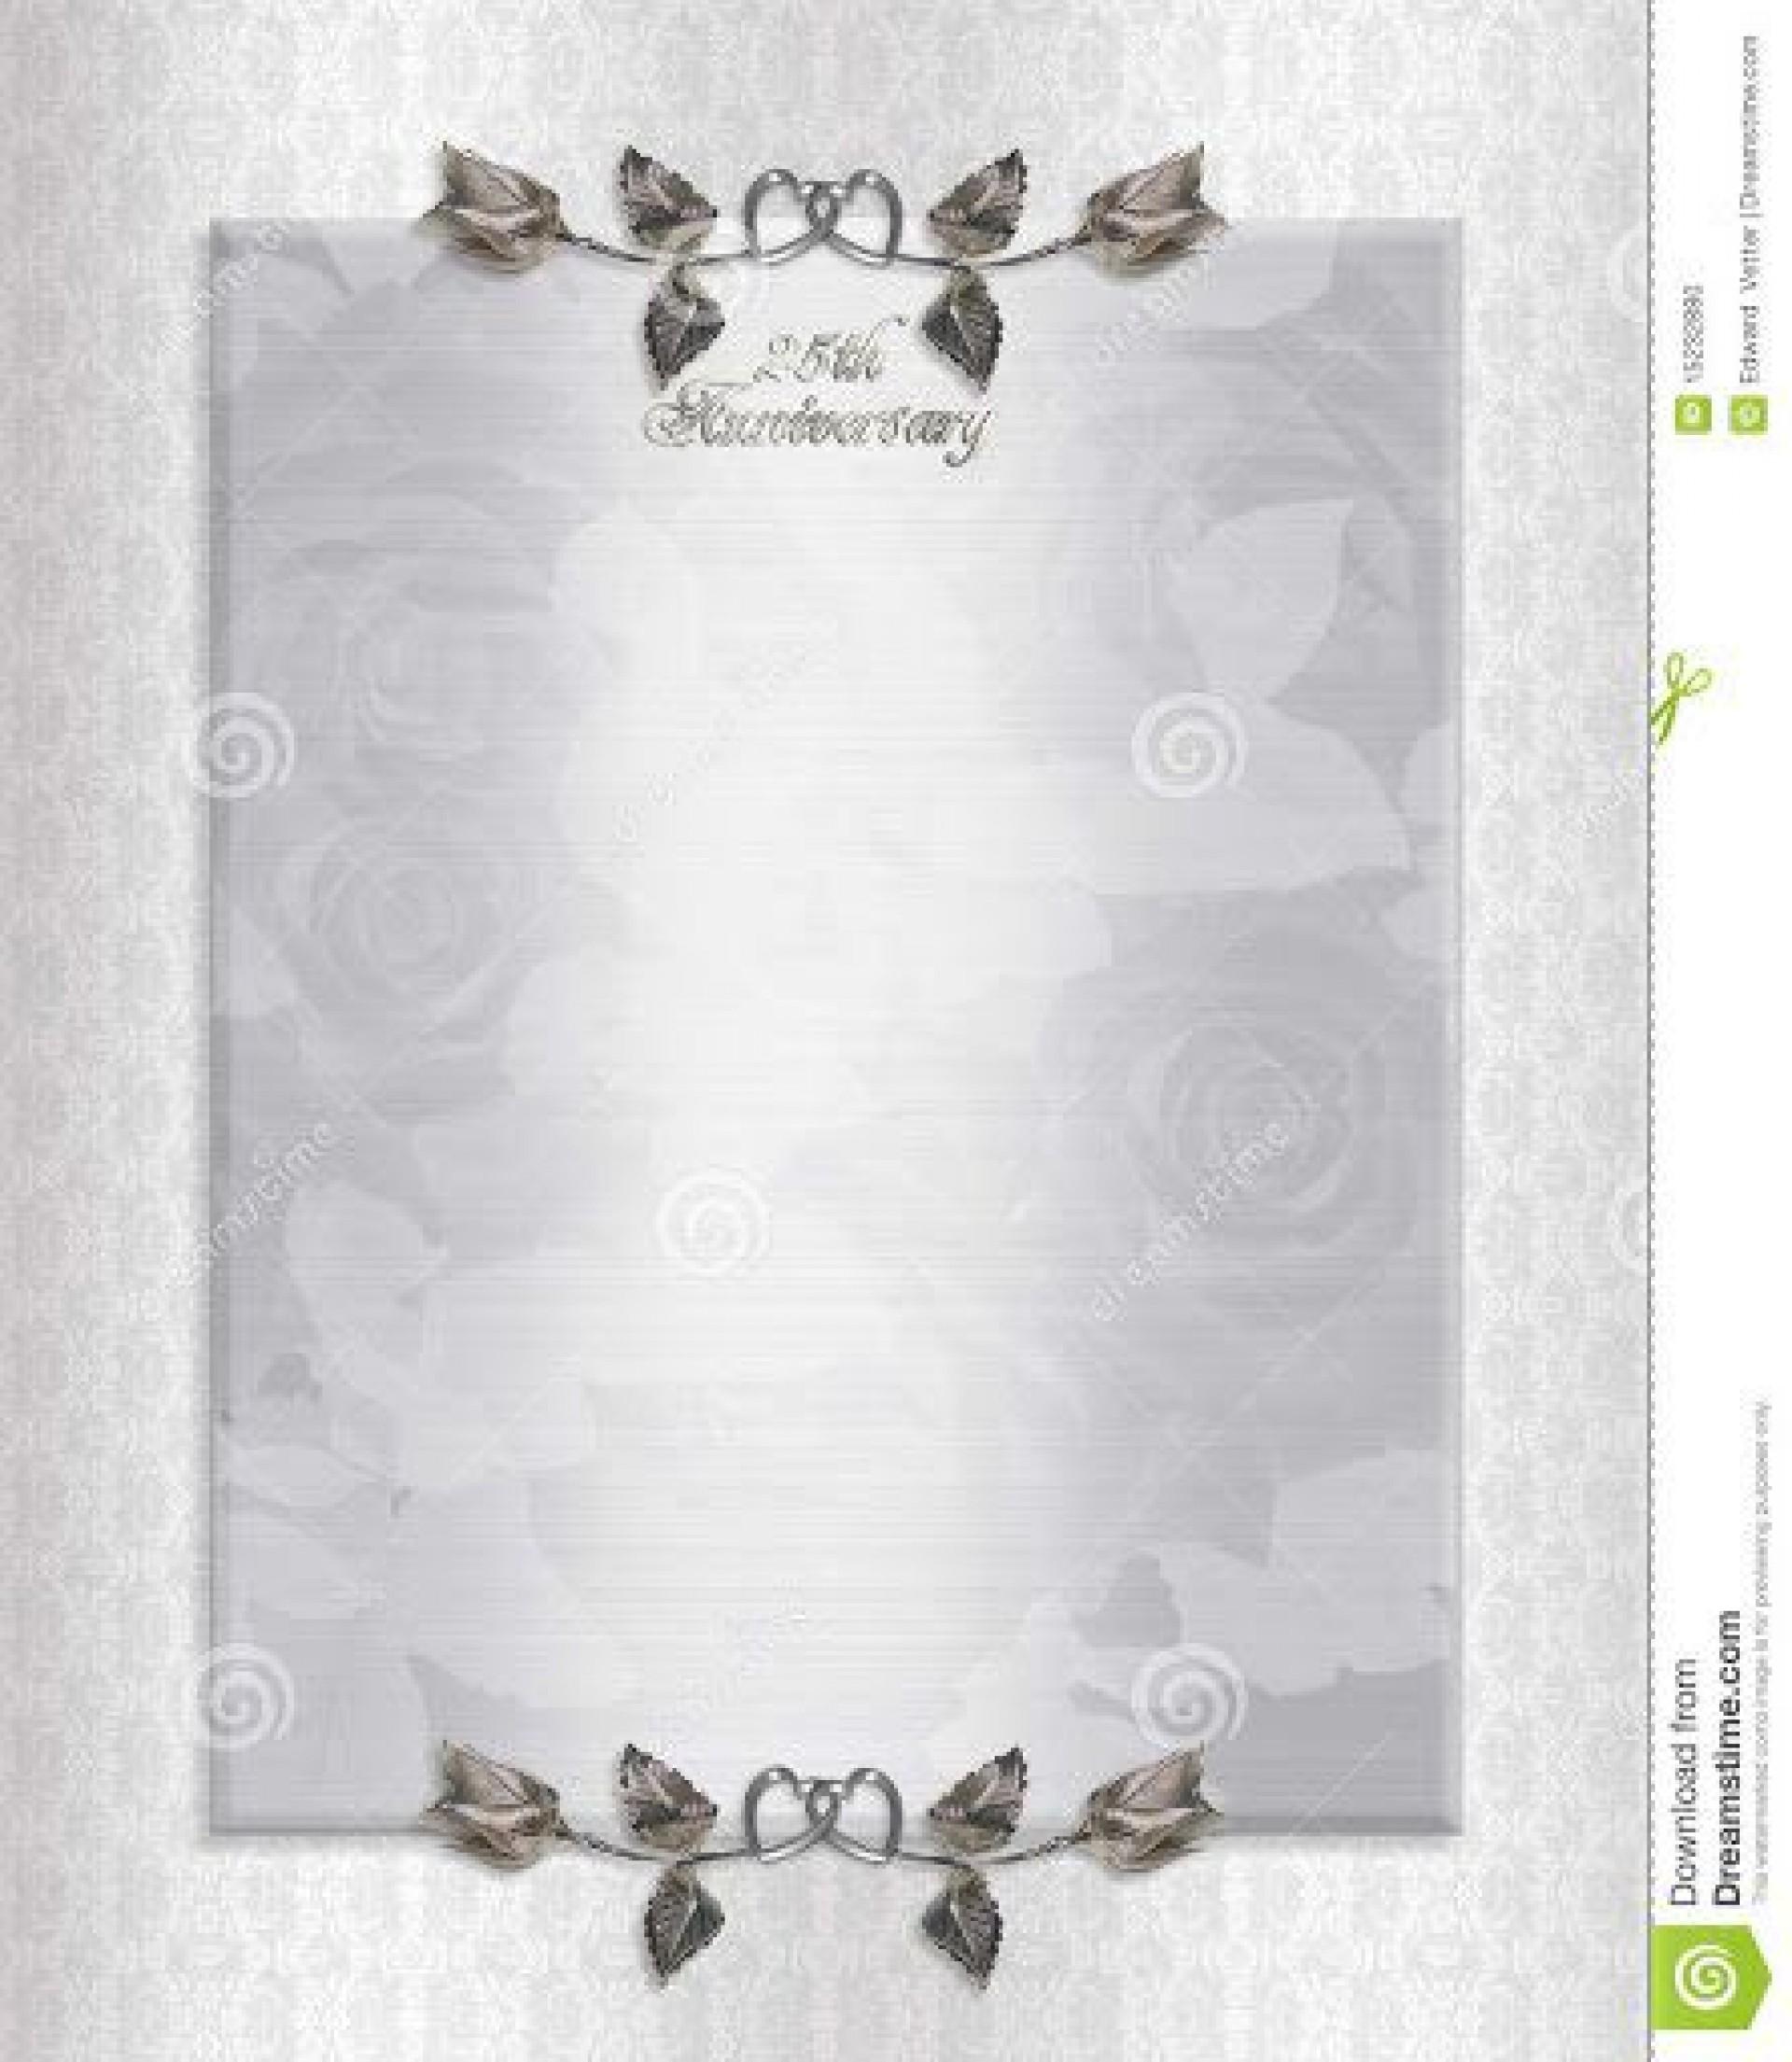 009 Surprising 50th Anniversary Invitation Template Free Concept  Download Golden Wedding1920